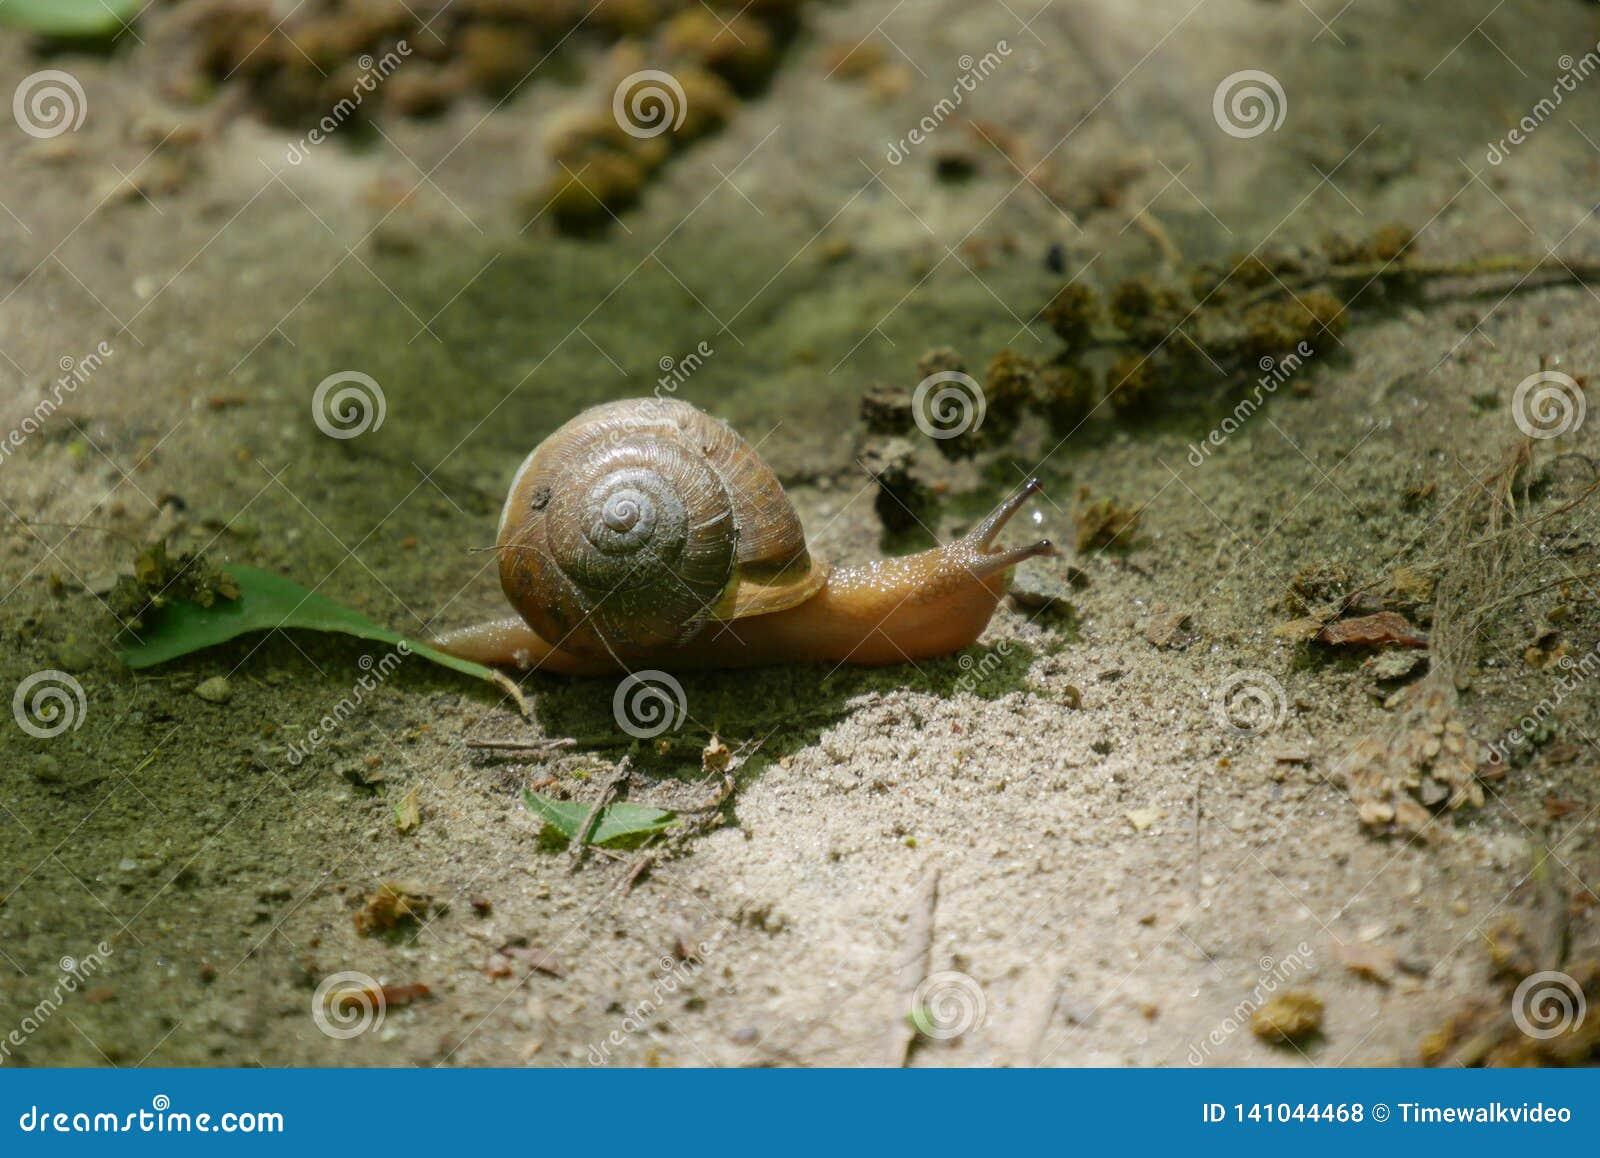 Macro tir d escargot sur la traînée